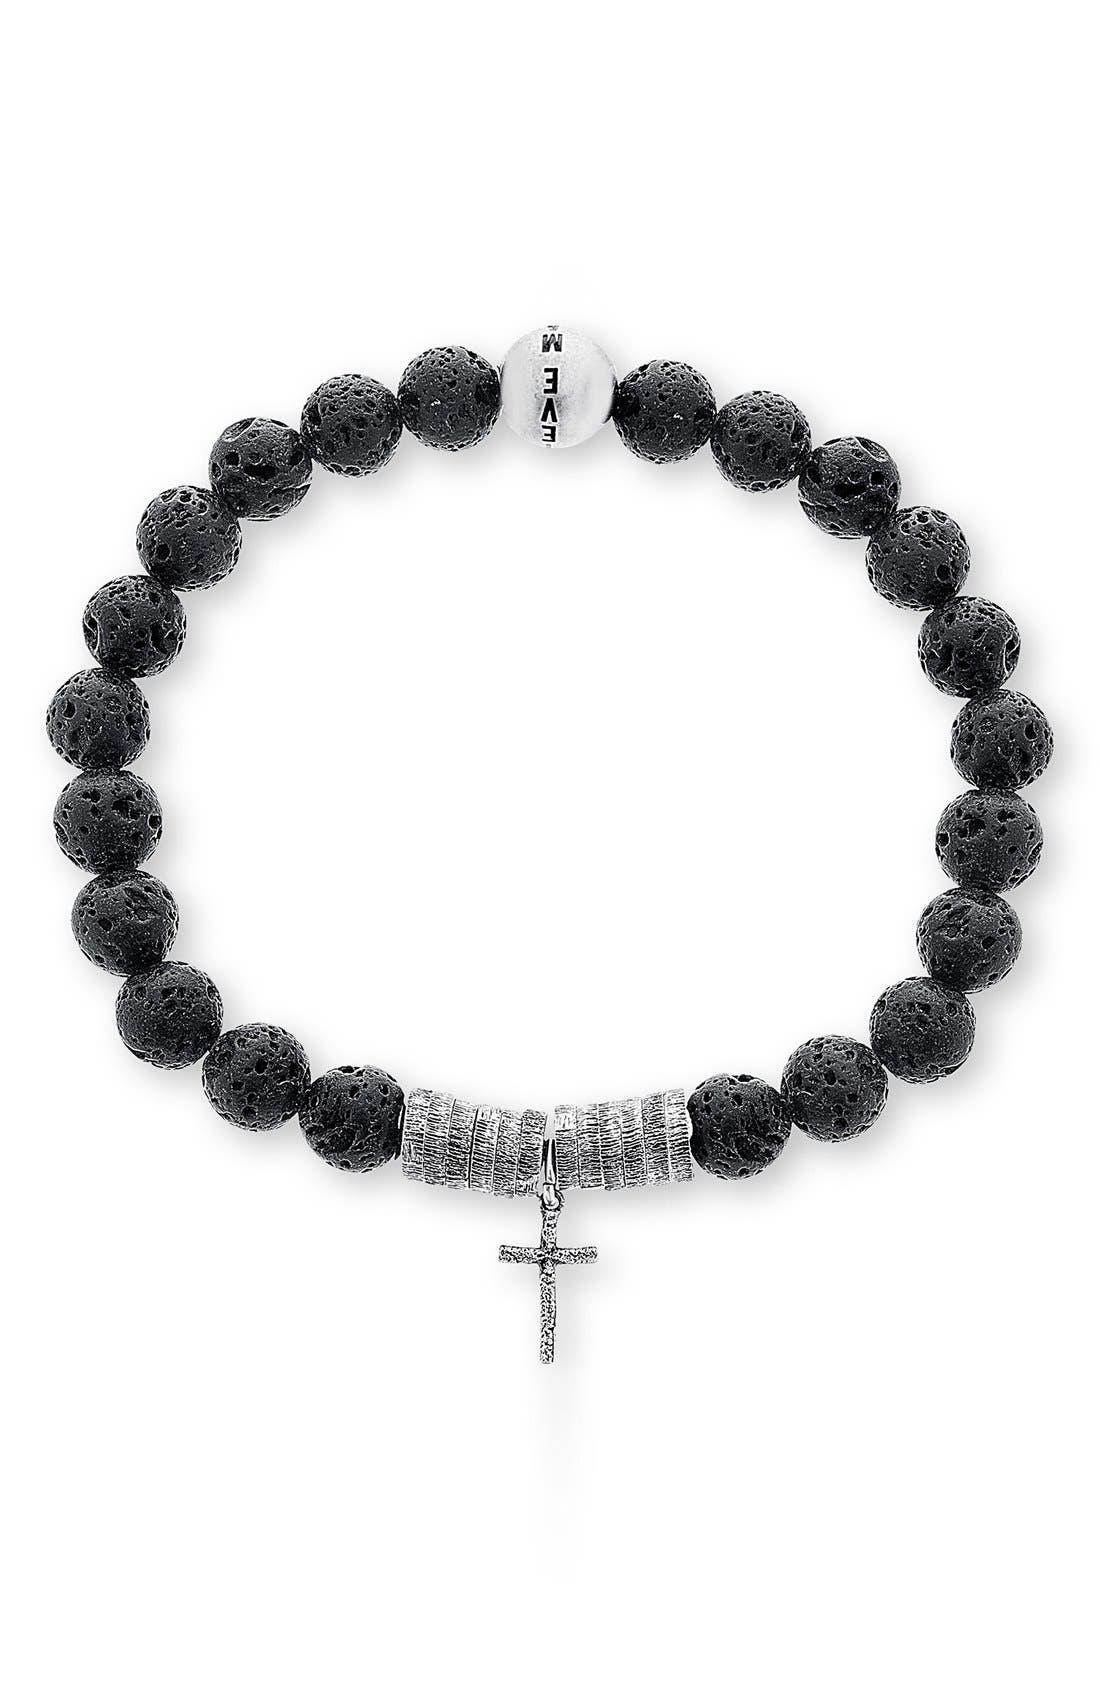 Lava Rock Bead Bracelet,                             Main thumbnail 1, color,                             BLACK